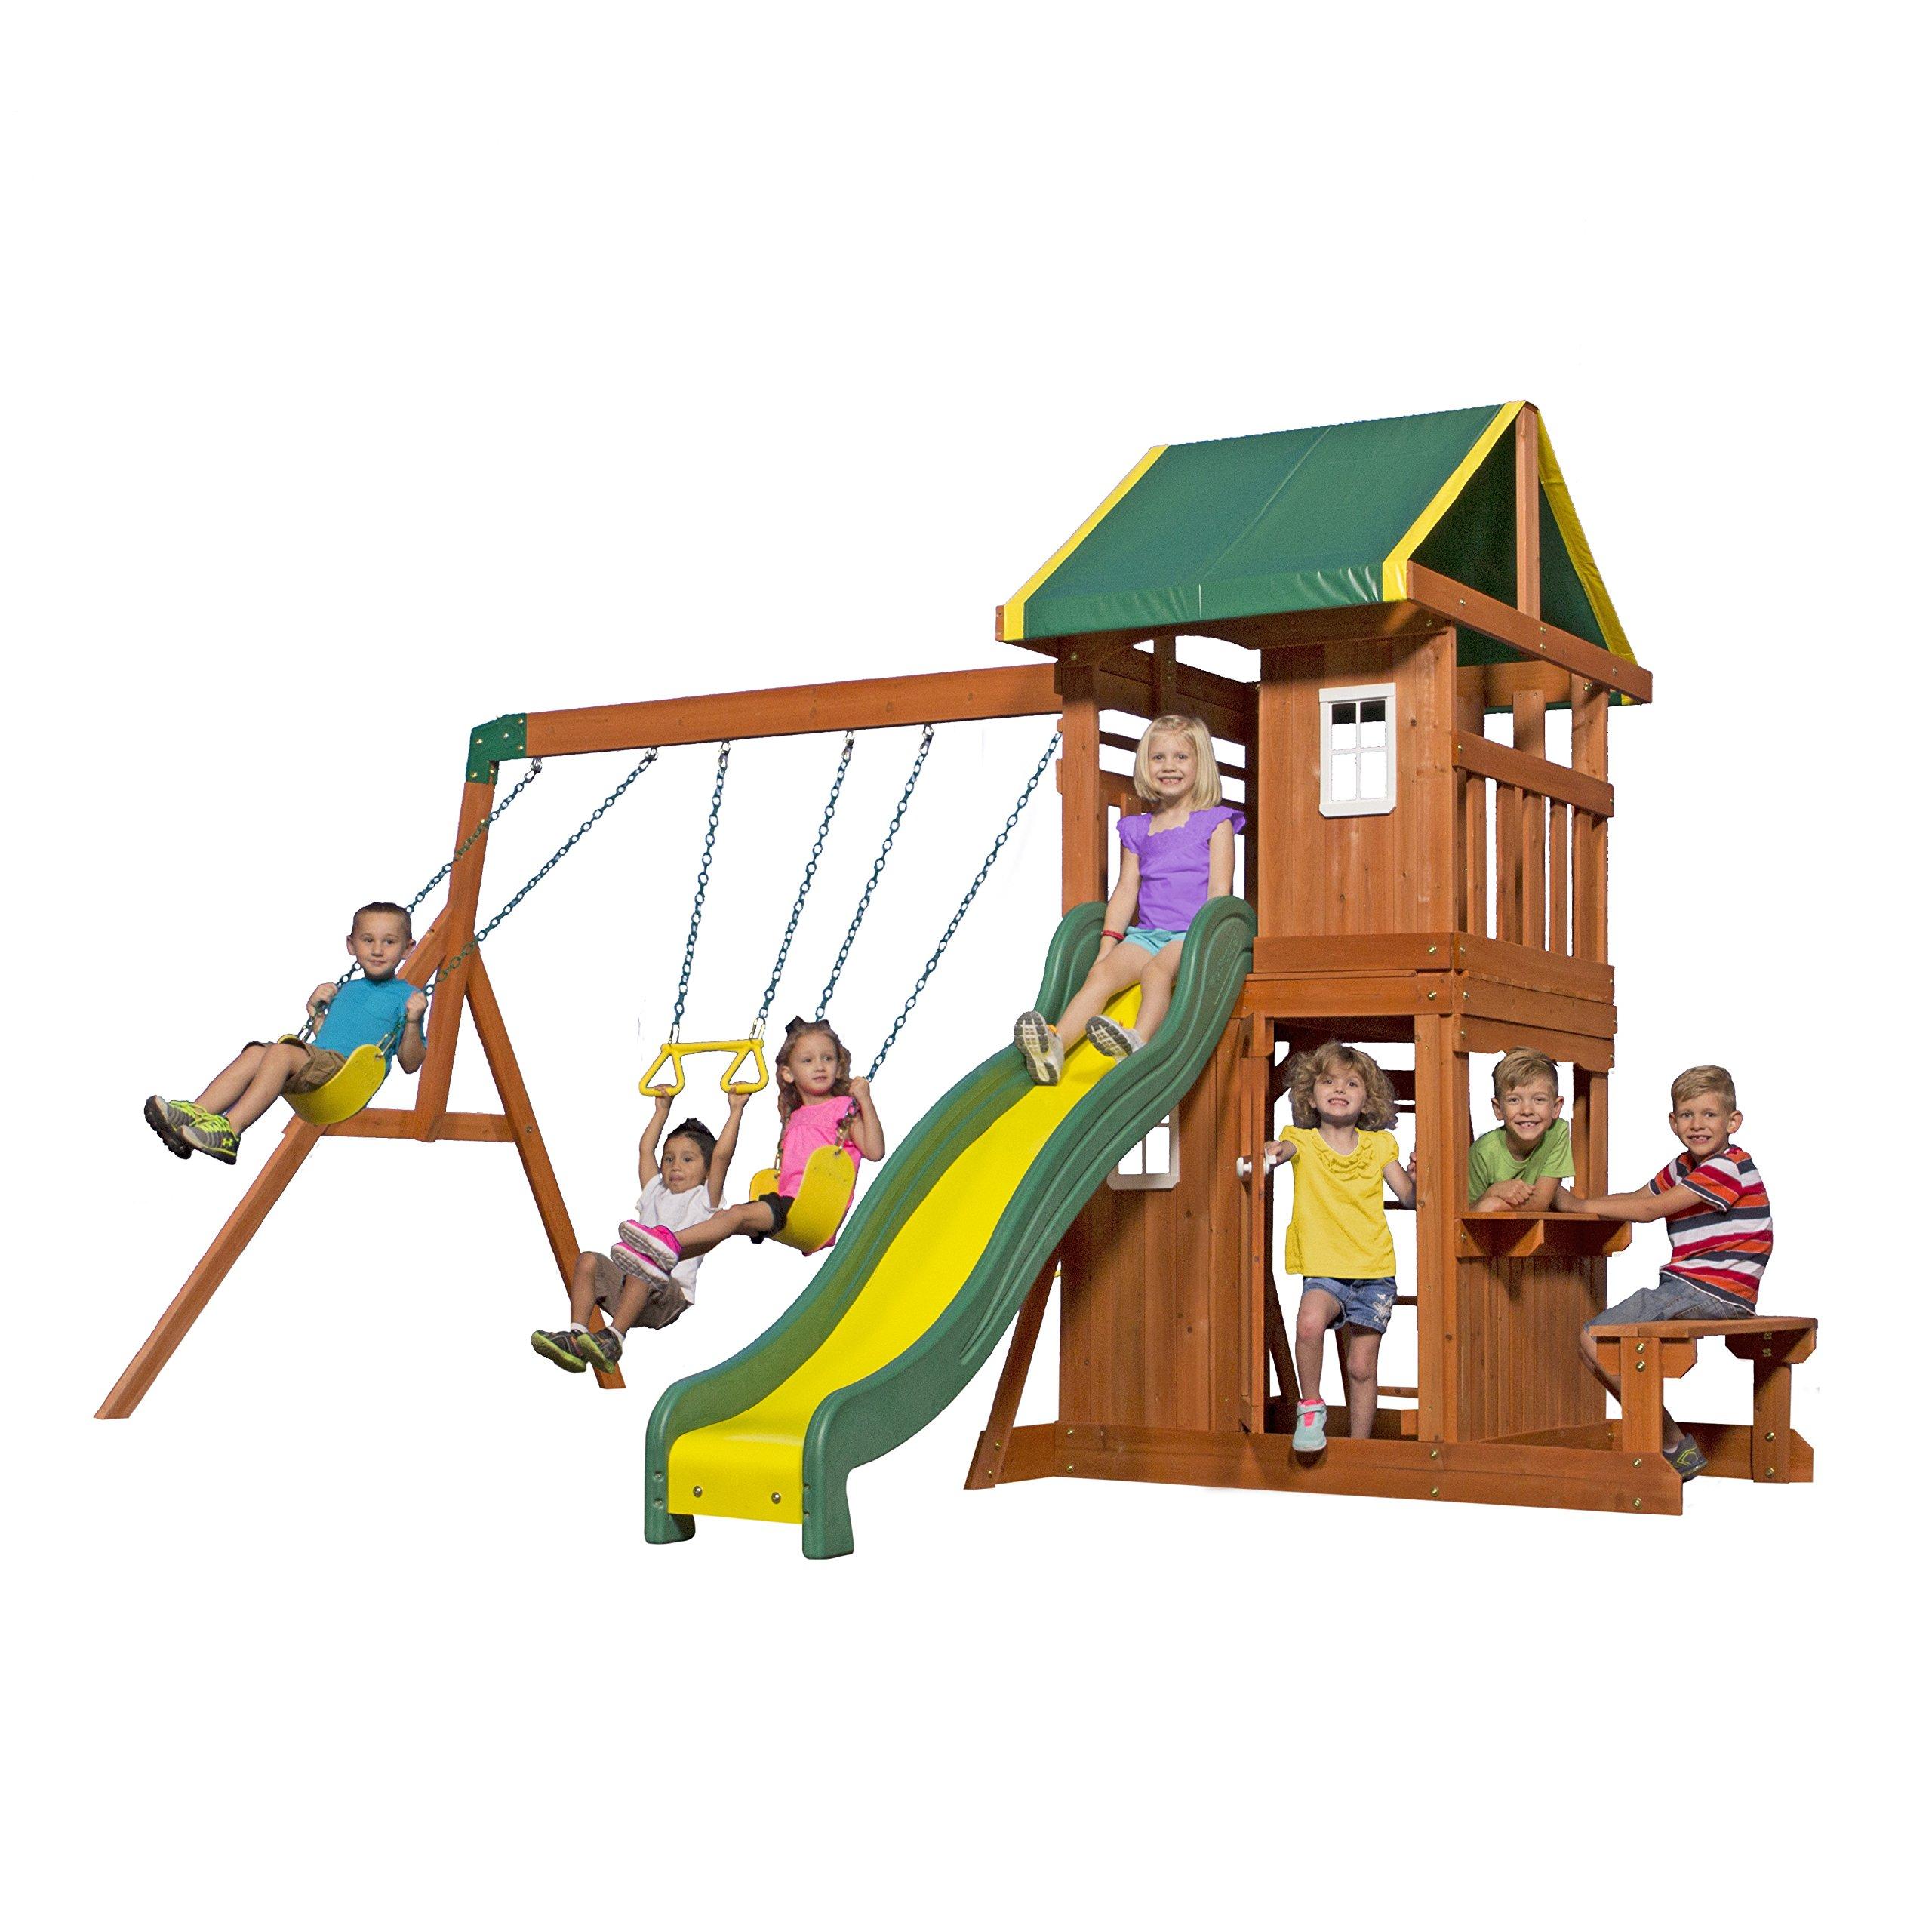 Backyard Discovery Oakmont All Cedar Wood Playset Swing Set by Backyard Discovery